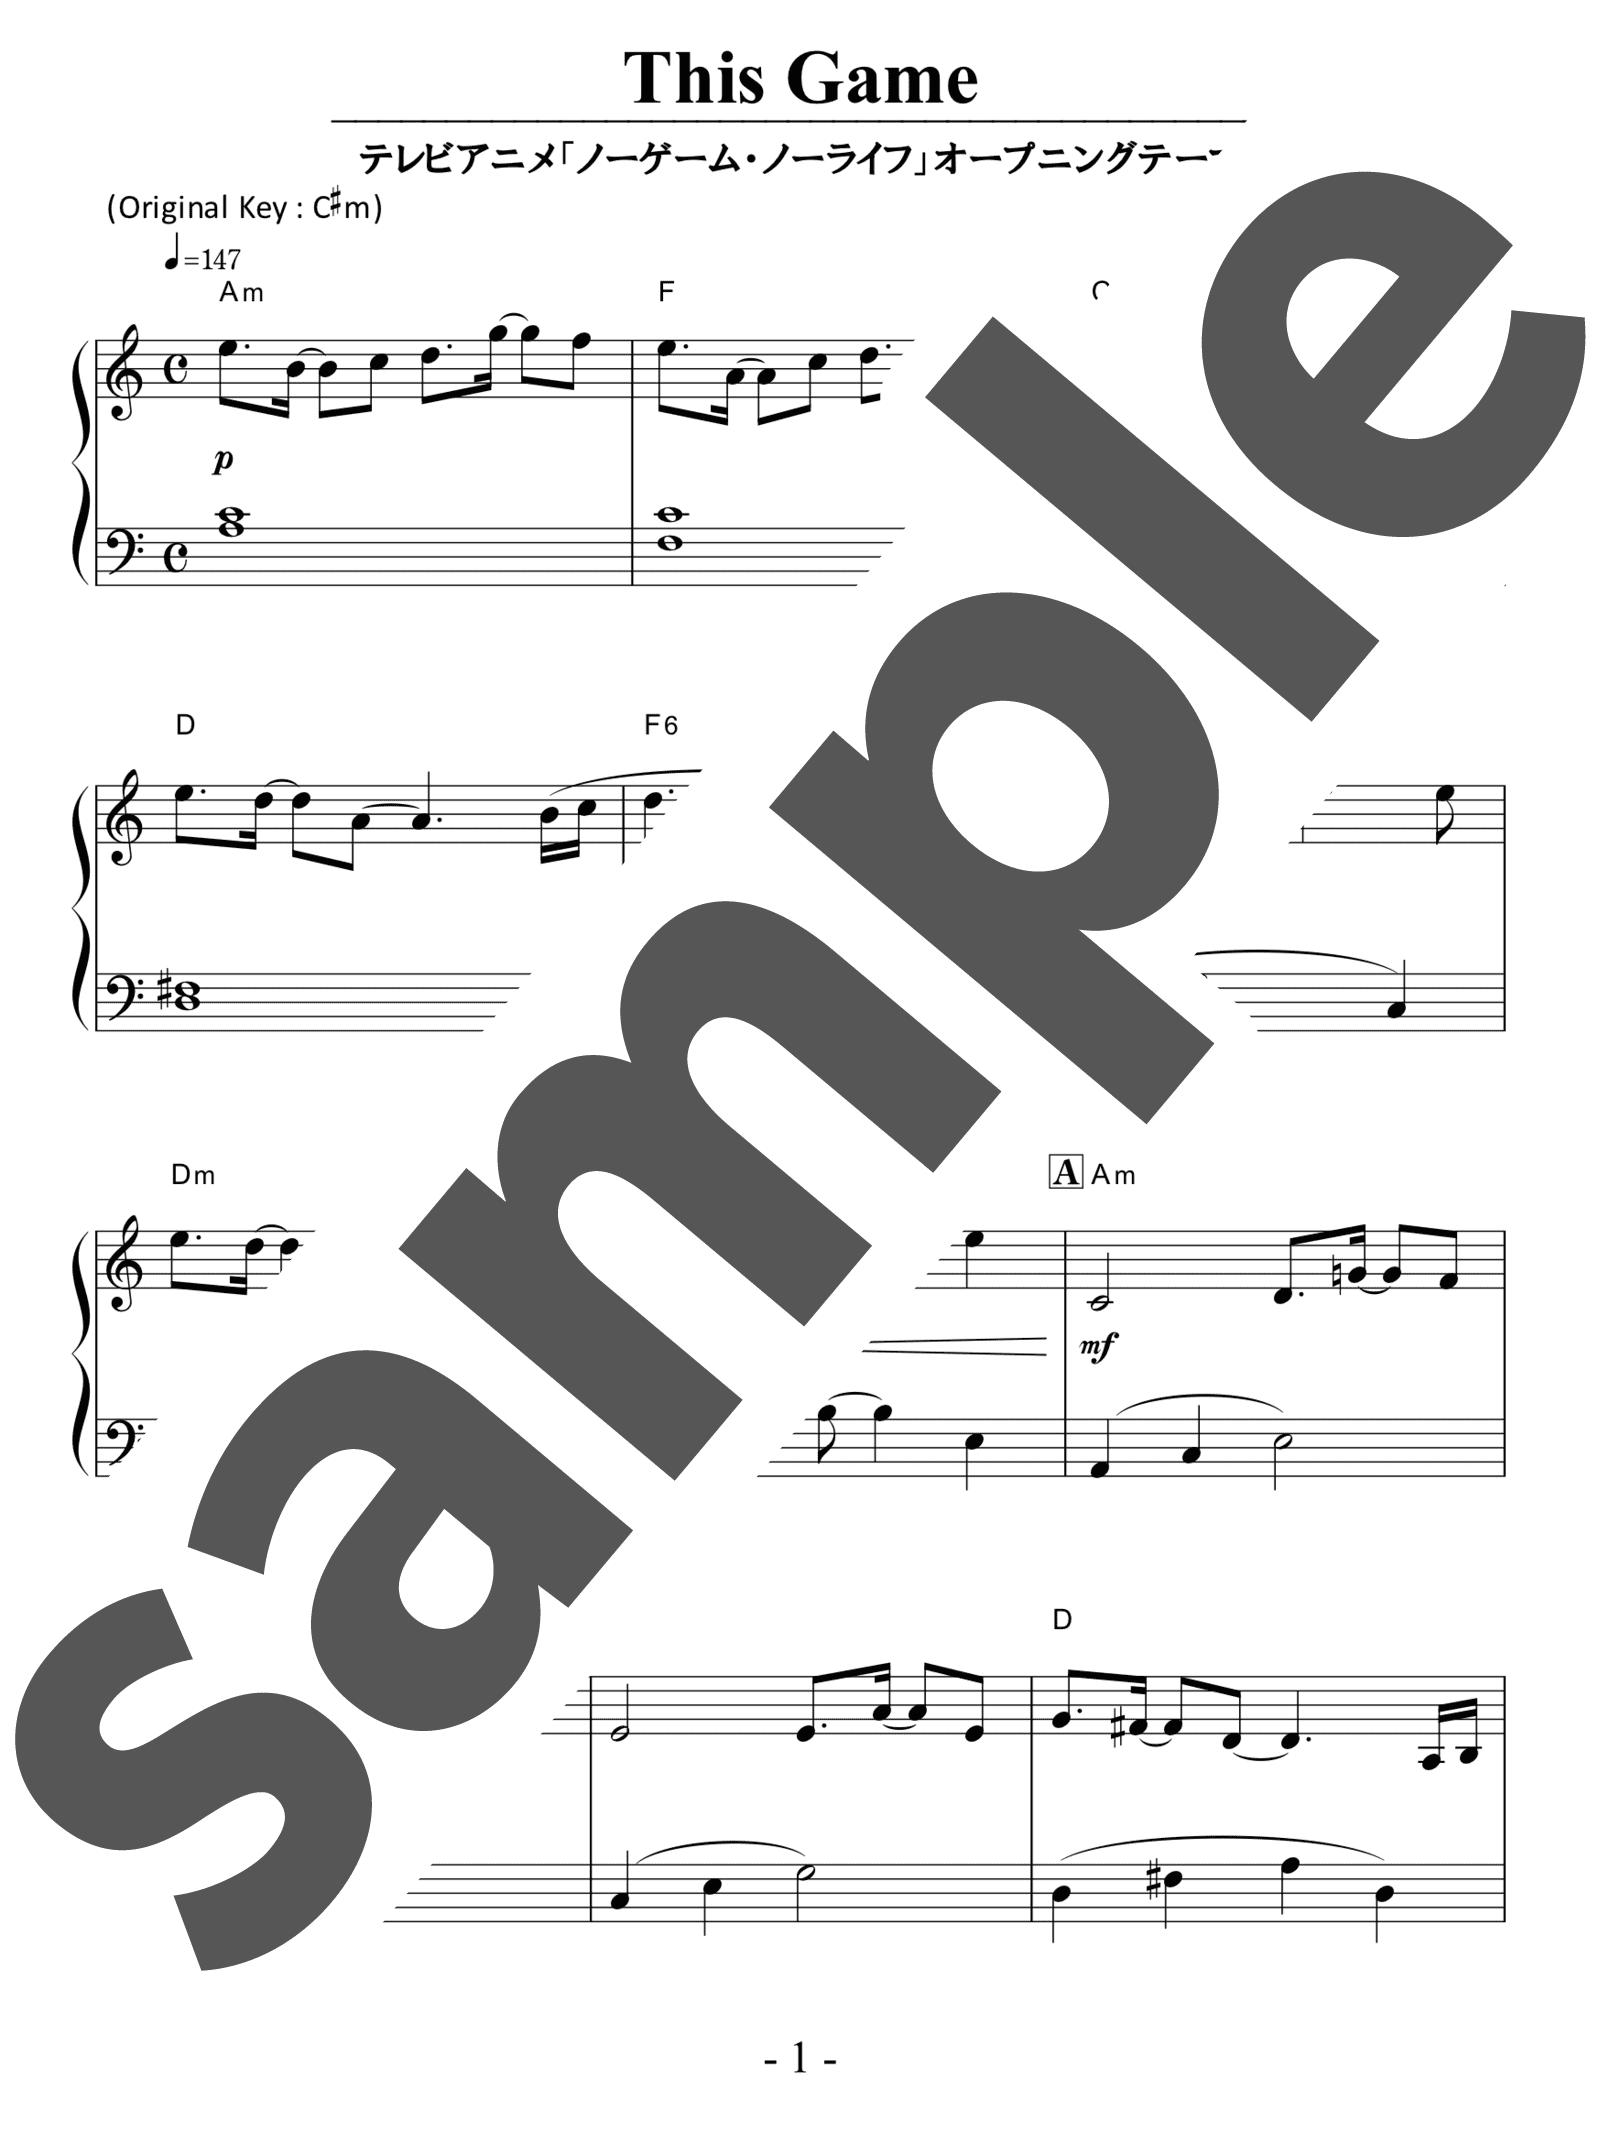 「This game」のサンプル楽譜